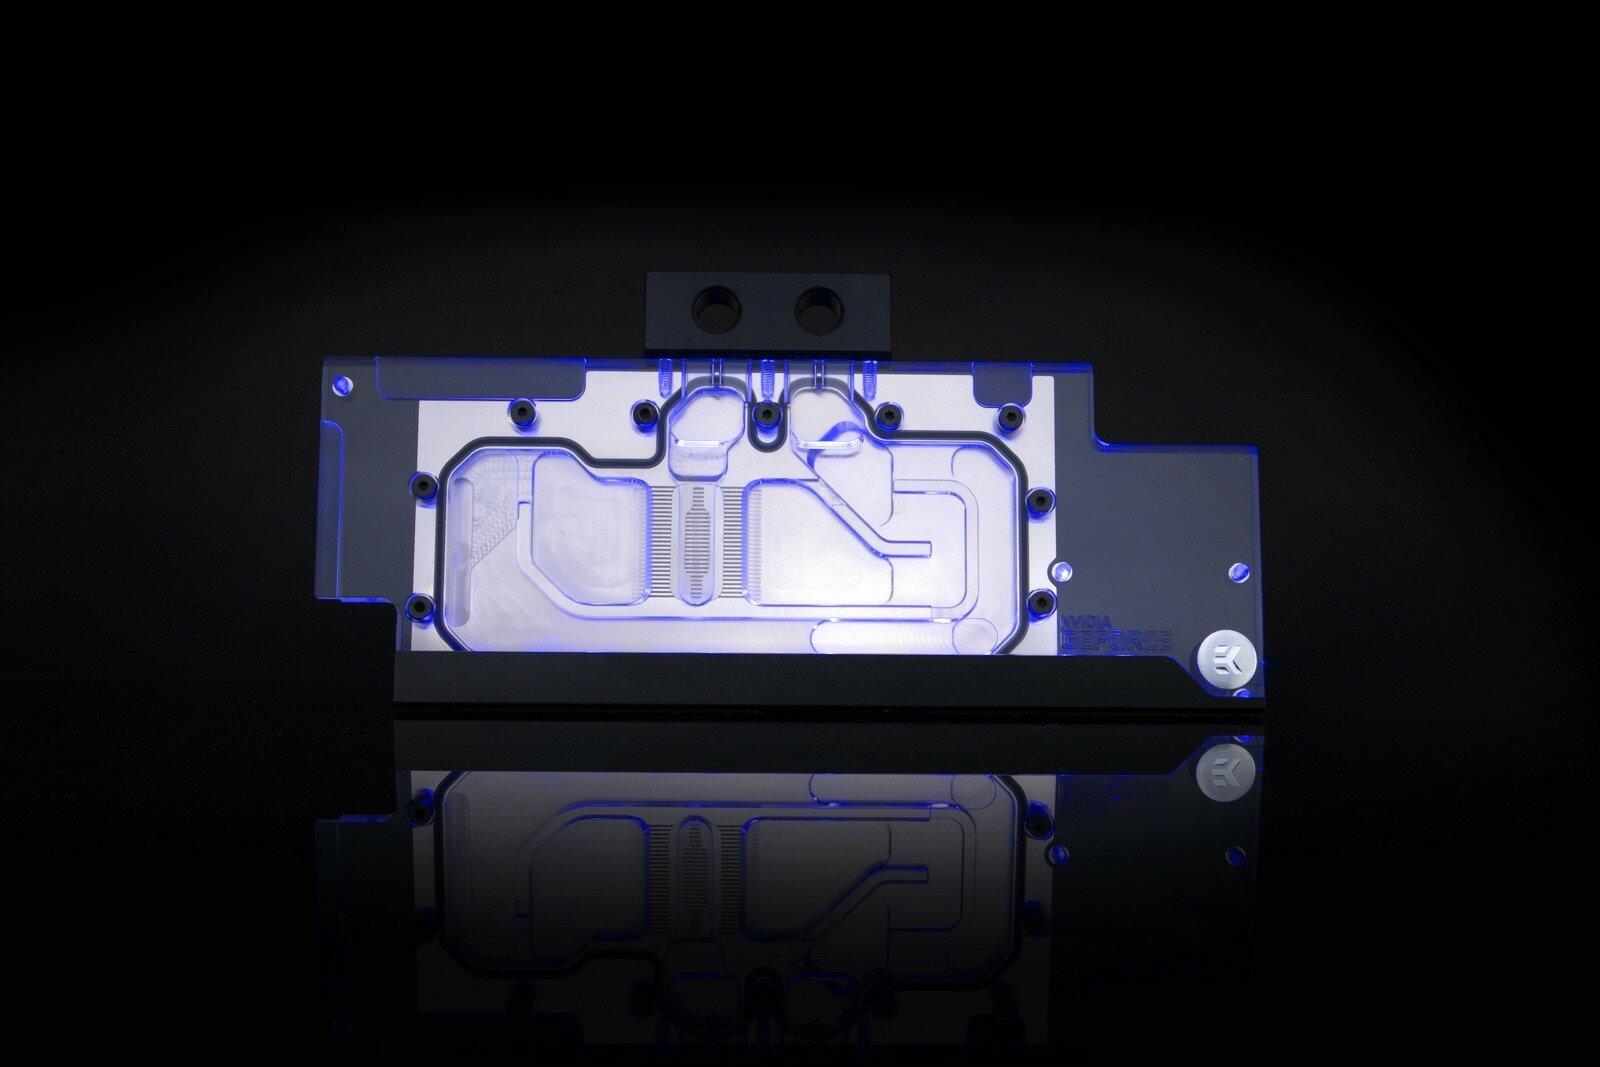 EK-FC RTX 2080+Ti Classic: Fullcover-GPU-Kühler für Nvidia Turing